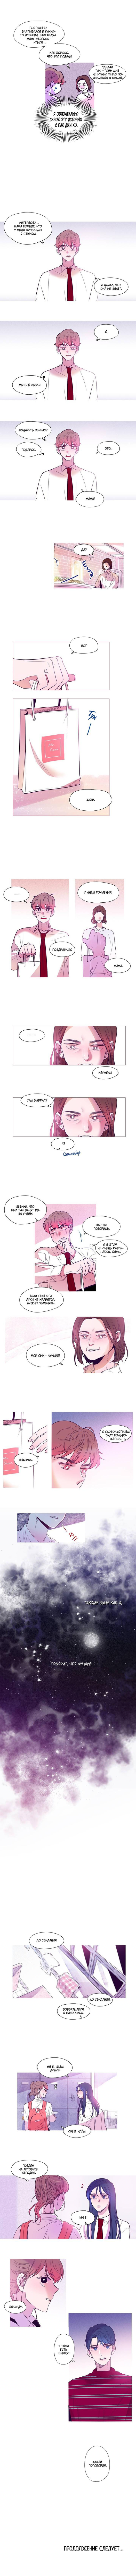 https://r2.ninemanga.com/comics/pic4/35/34723/1363264/1560106170346.jpg Page 6